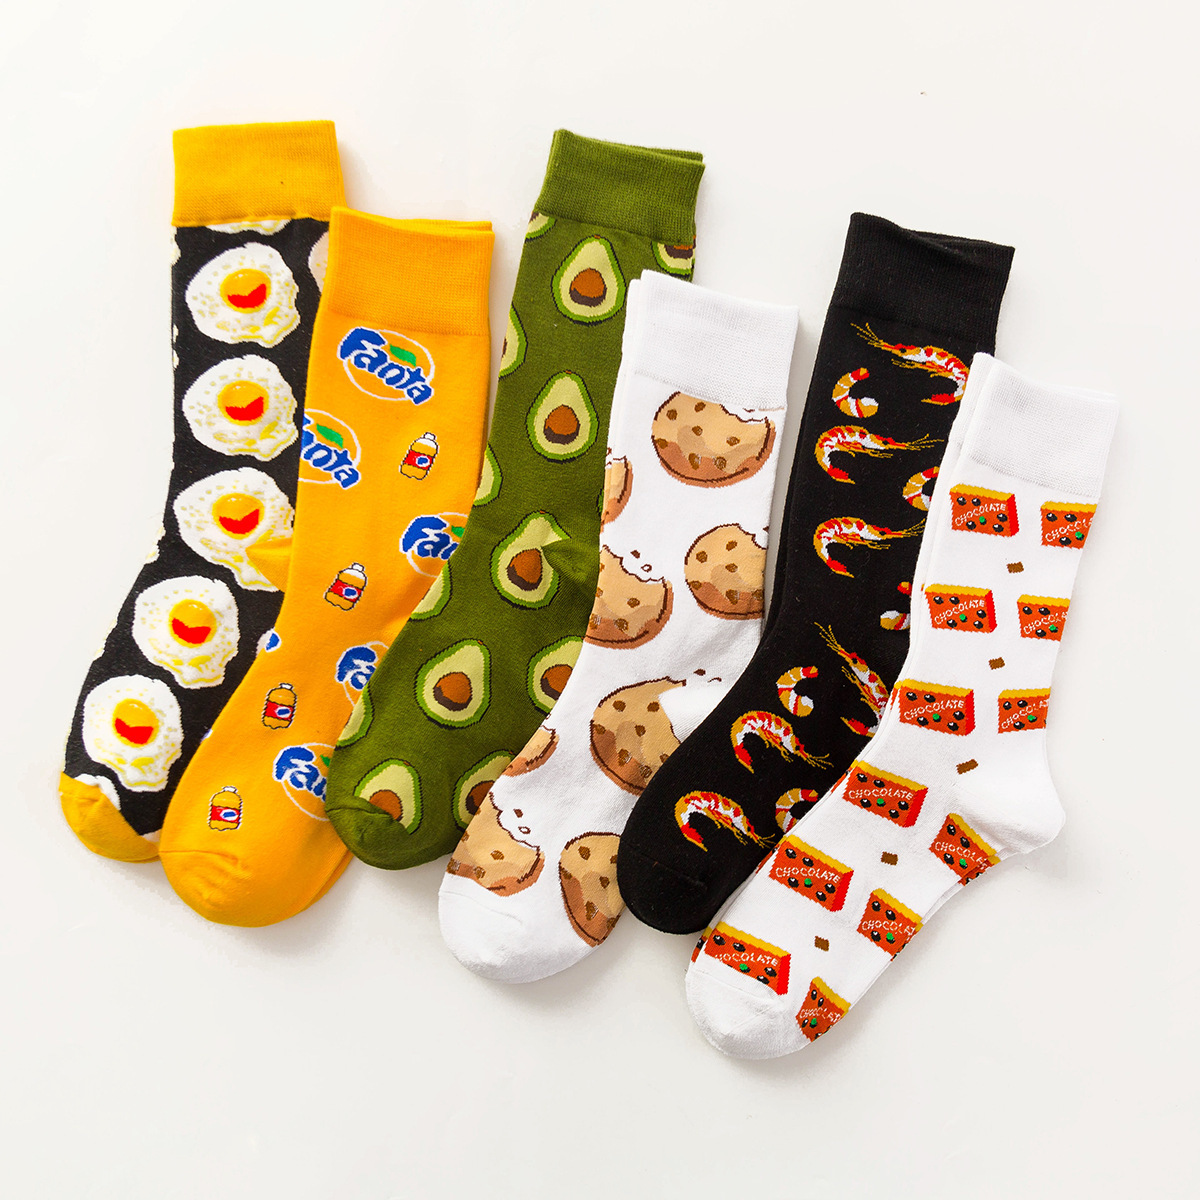 Cartoon Food Avocado / Cookies / Eggs Harajuku Socks Japanese Hip Hop Yellow Funny Socks Creative Lovely Sokken Calcetines